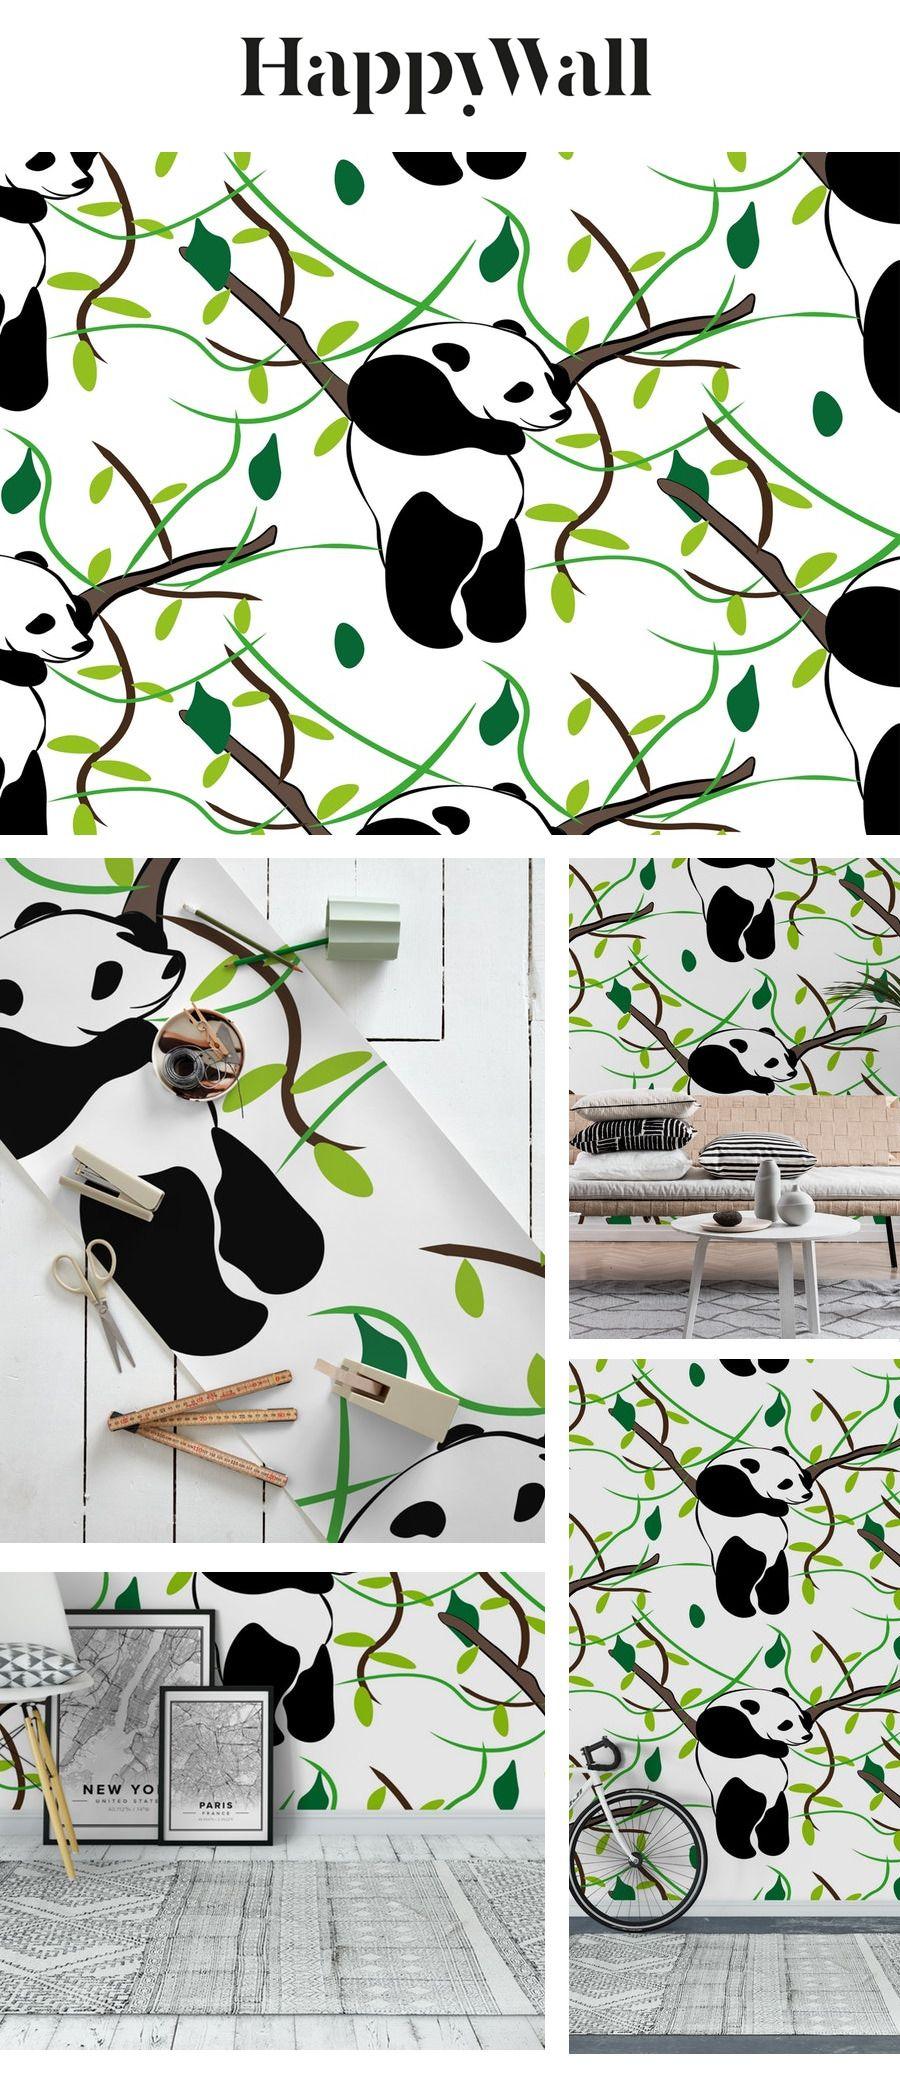 Pandas Wall mural in 2020 Panda wallpapers, Wall murals